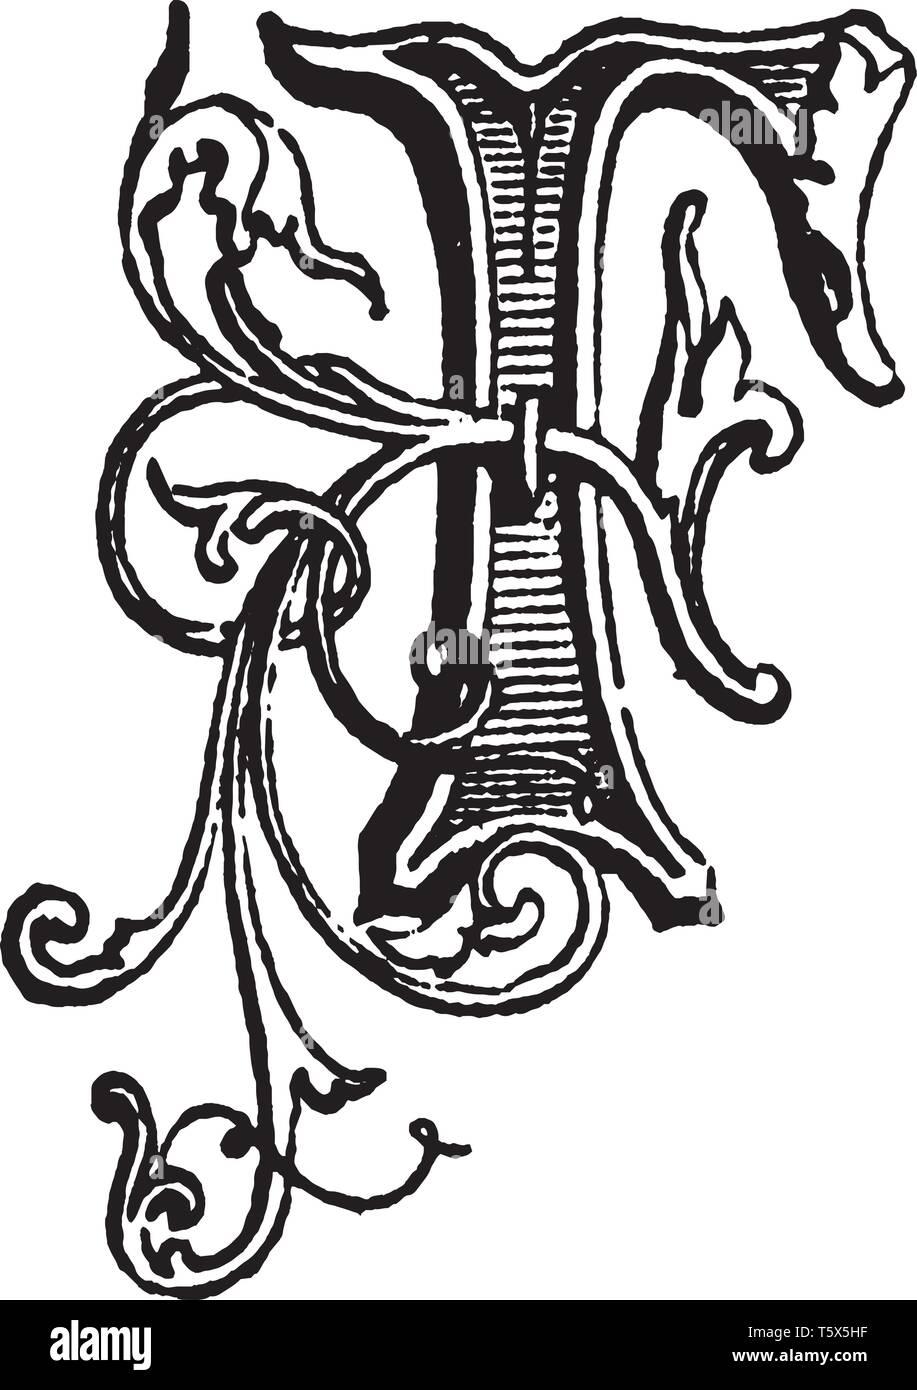 A Decorative And Floral Capital Letter F Vintage Line